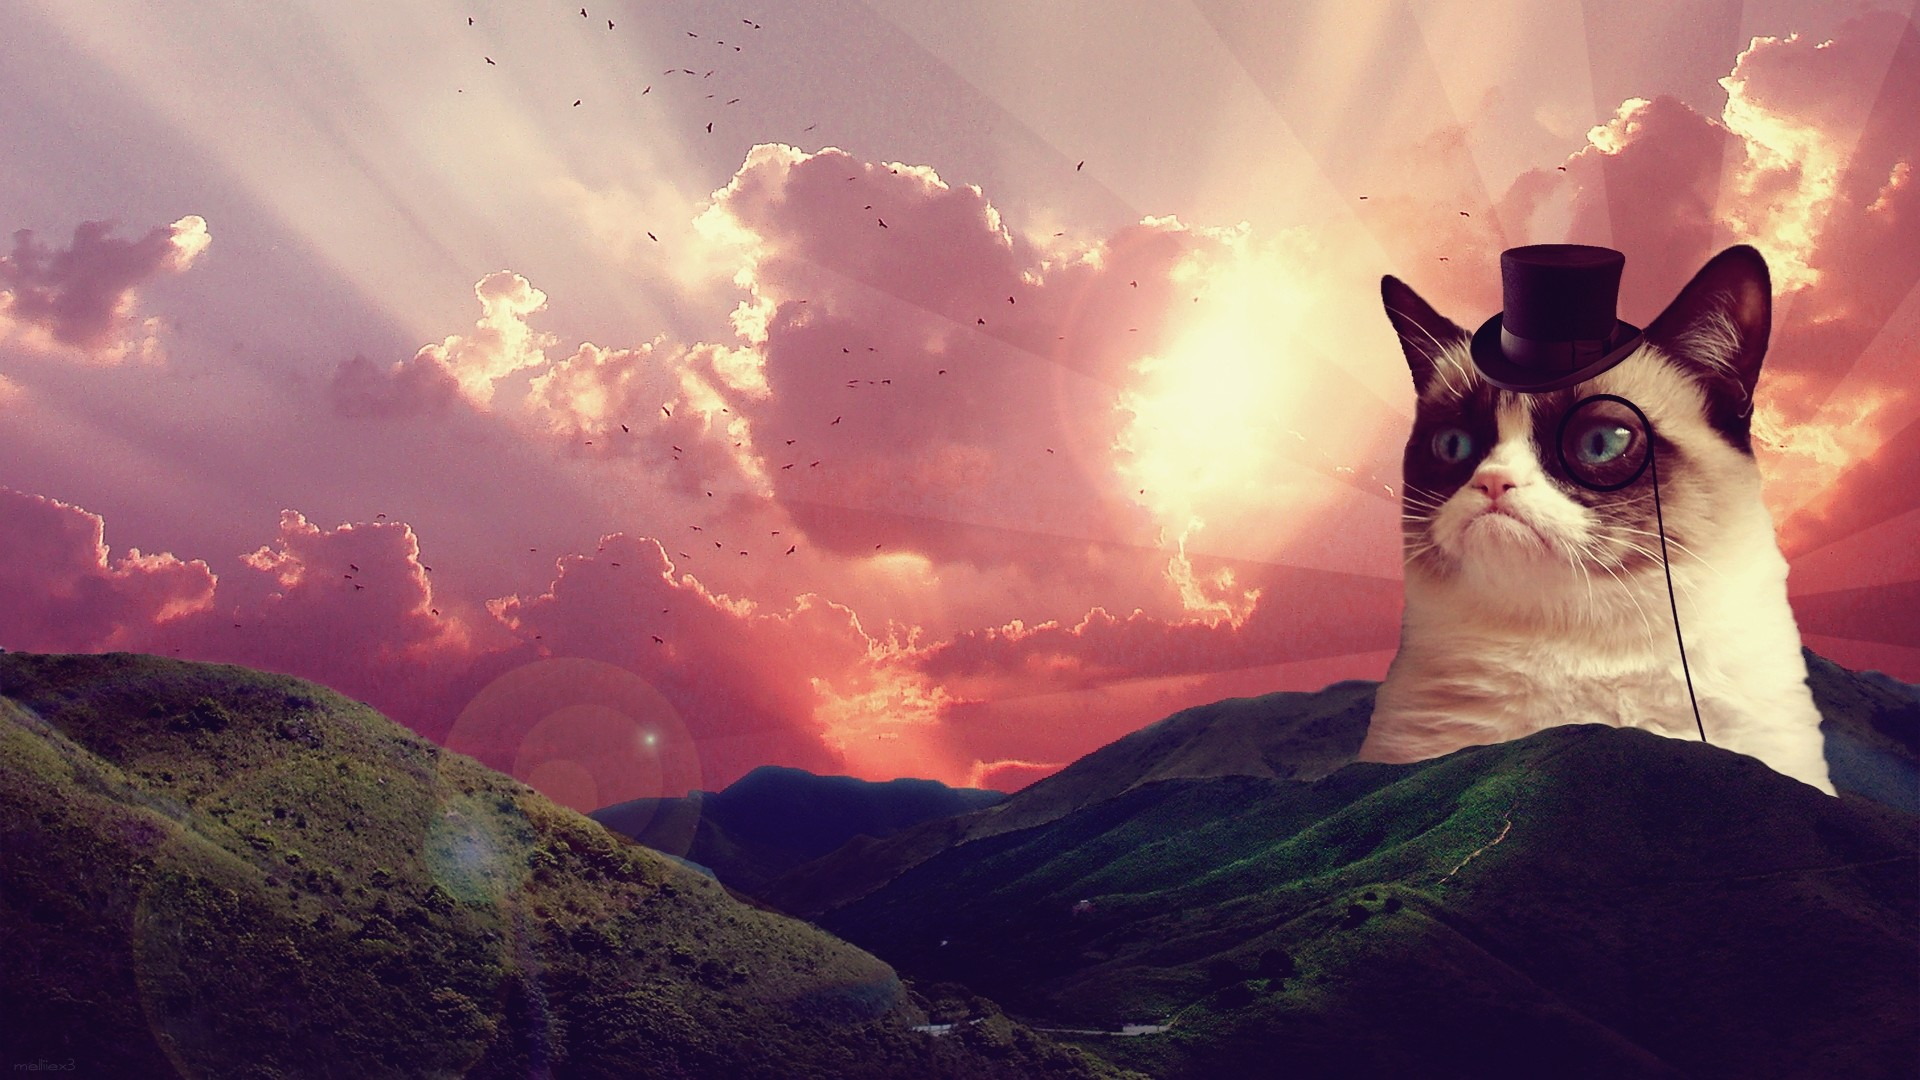 Cat Backgrounds Tumblr 1920x1080